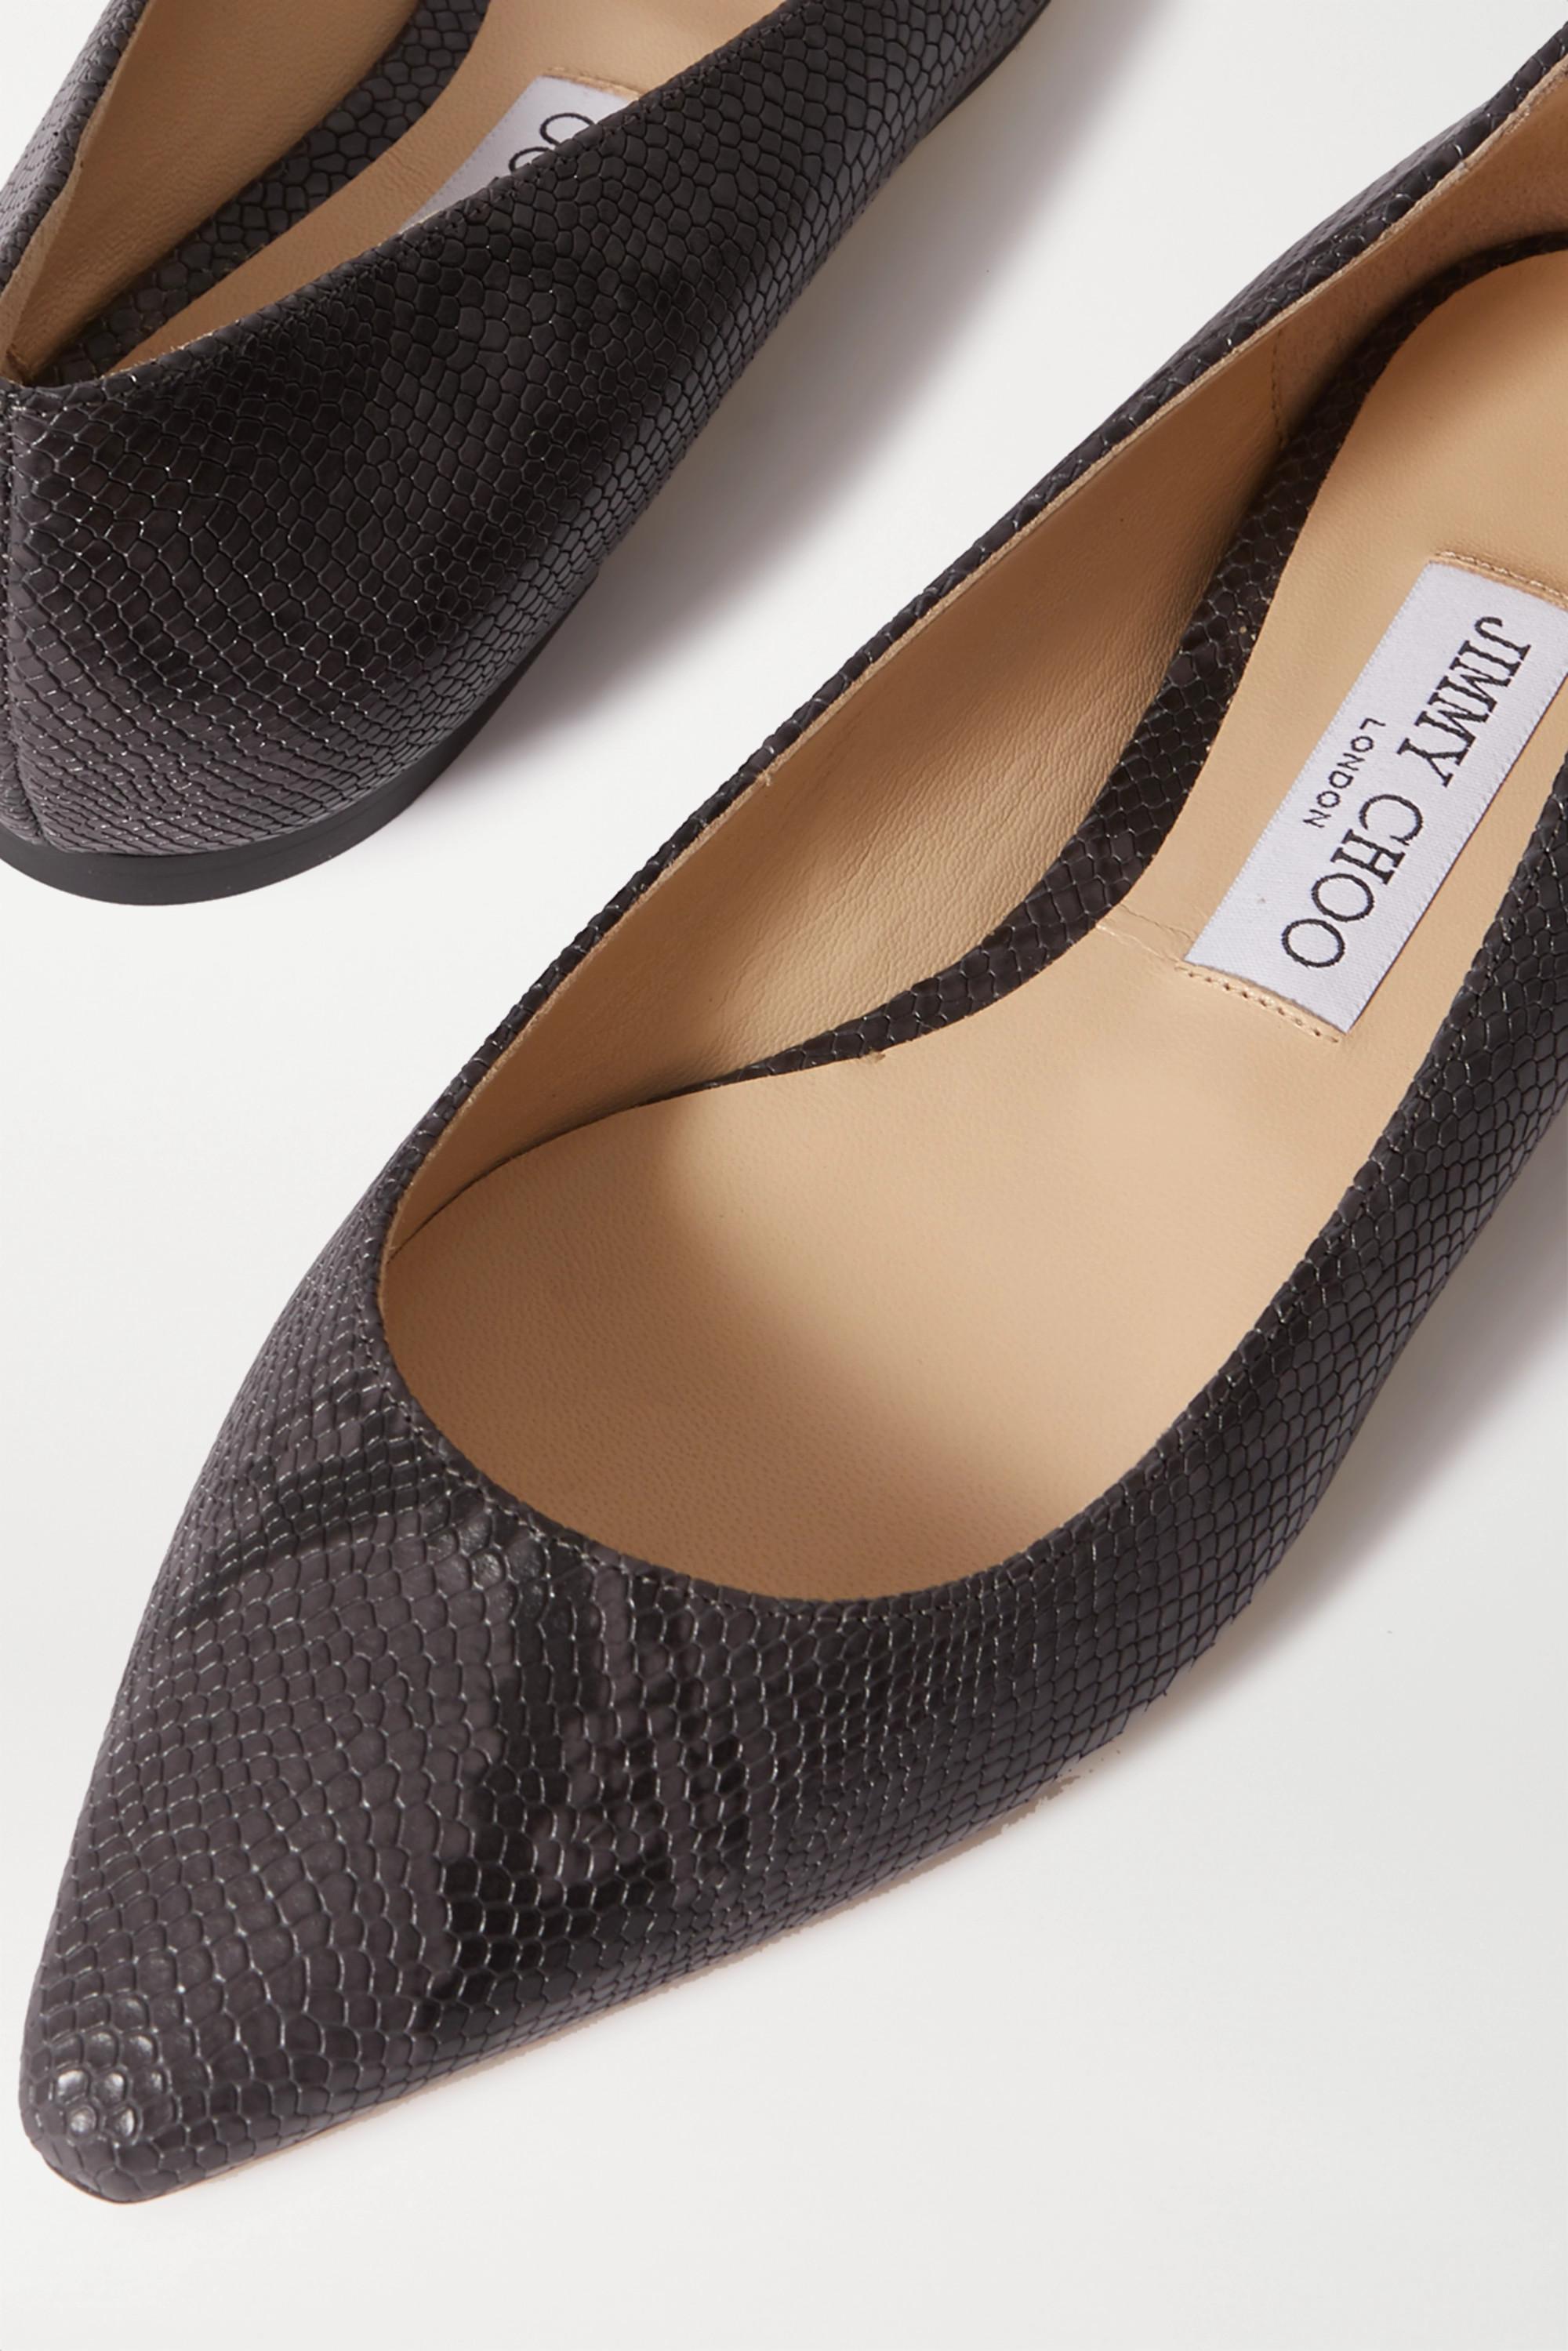 Jimmy Choo Romy snake-effect leather point-toe flats